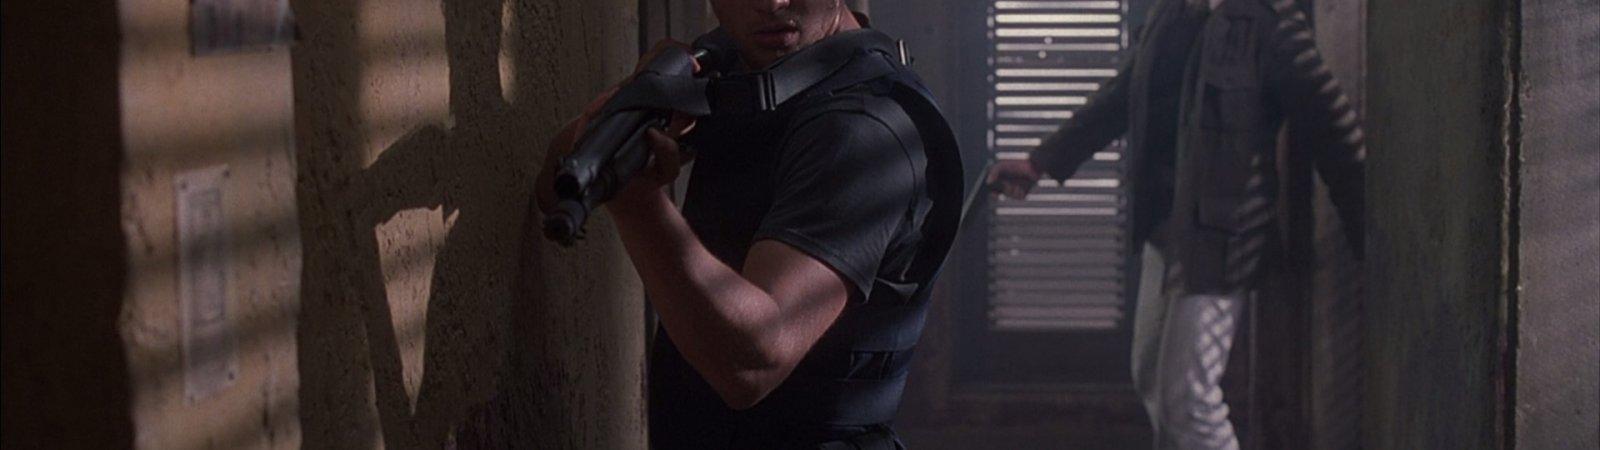 Photo du film : Way of the gun